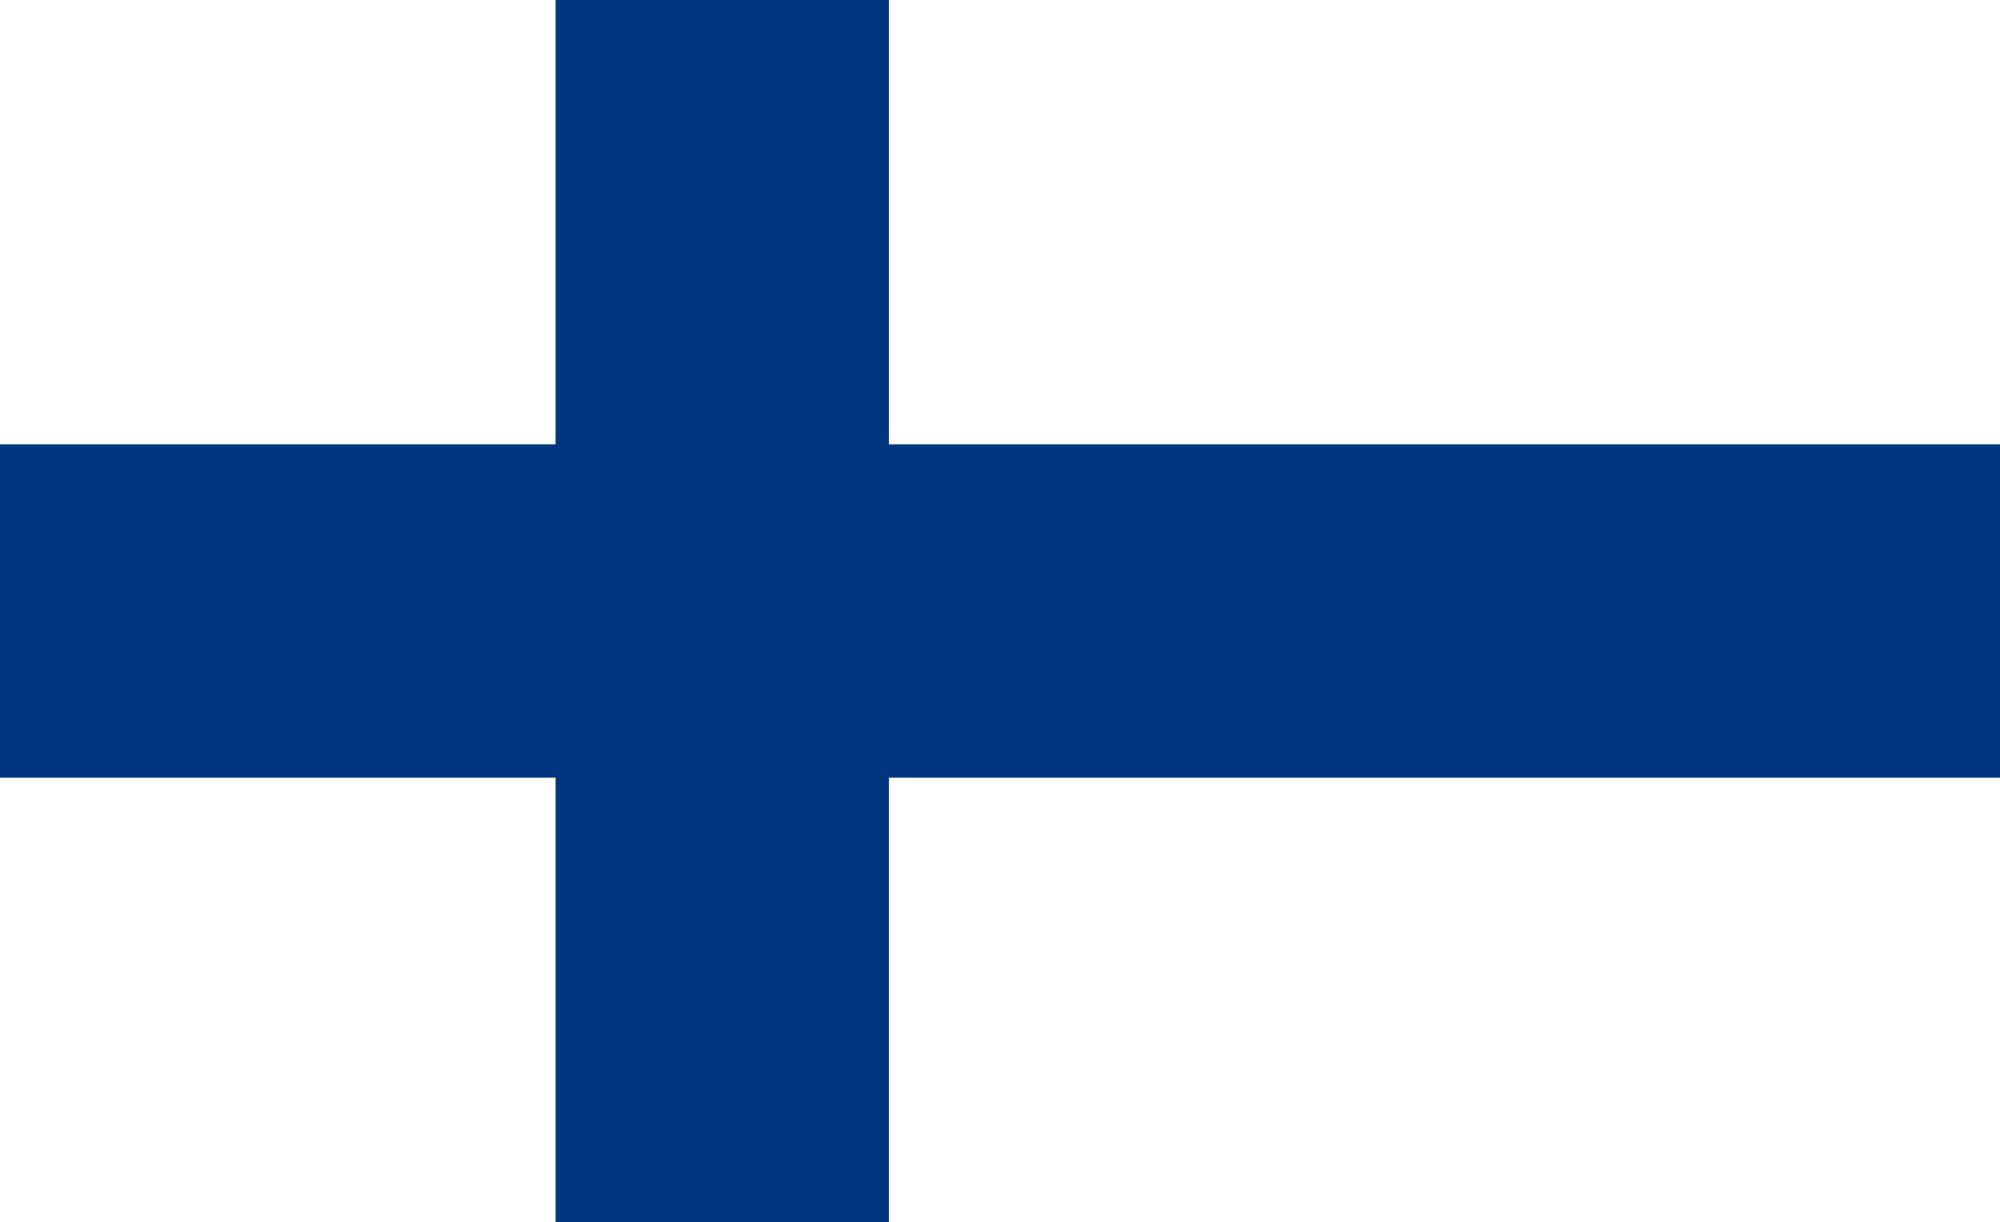 Finnish For The Beginners Dog Koira Imgur